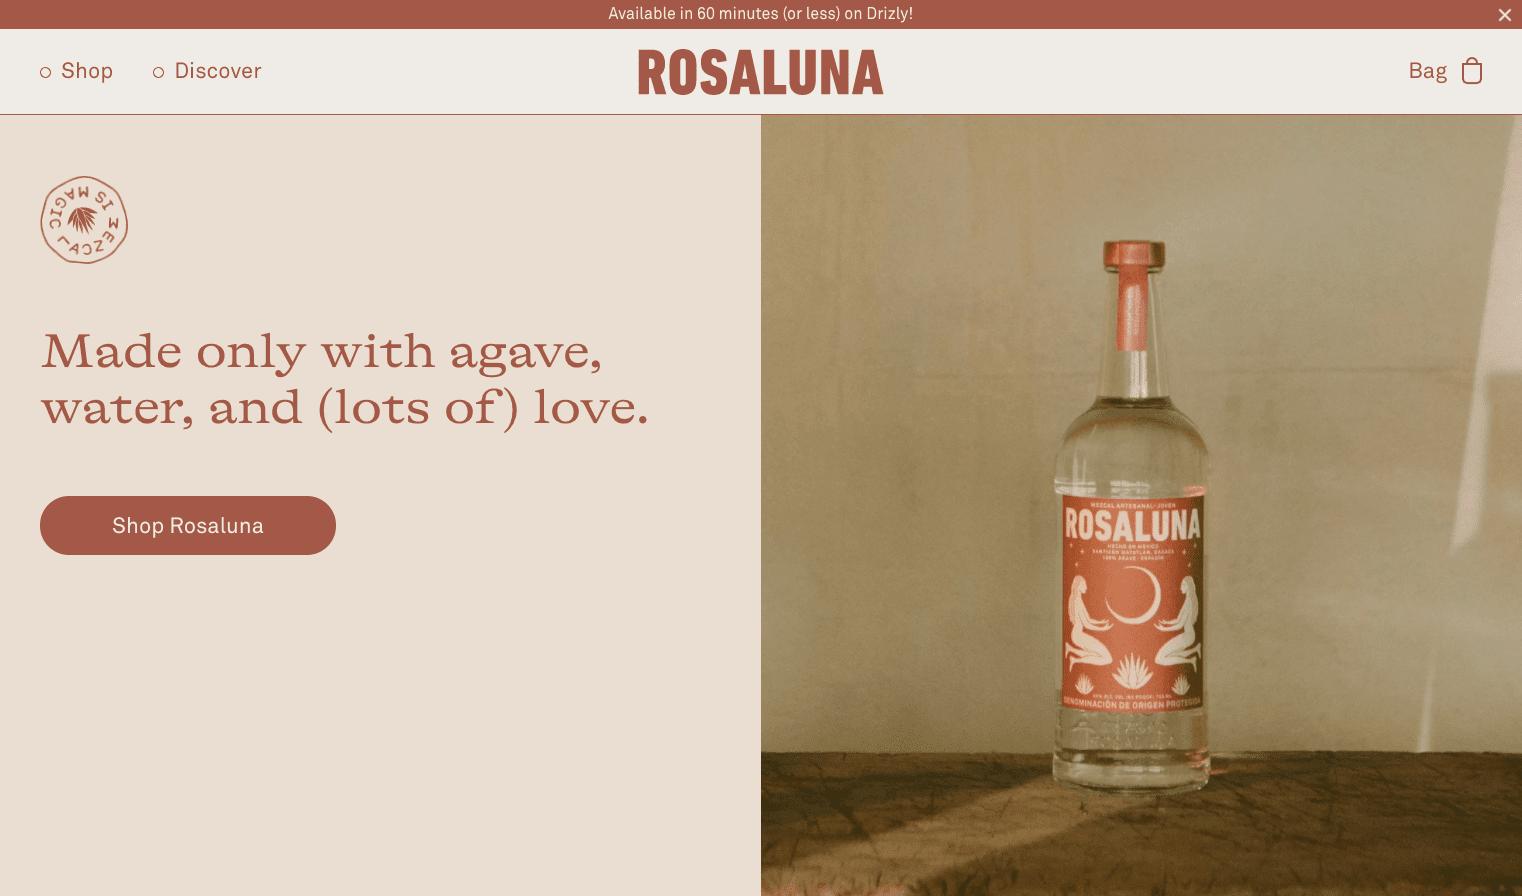 Rosaluna webpage screenshot